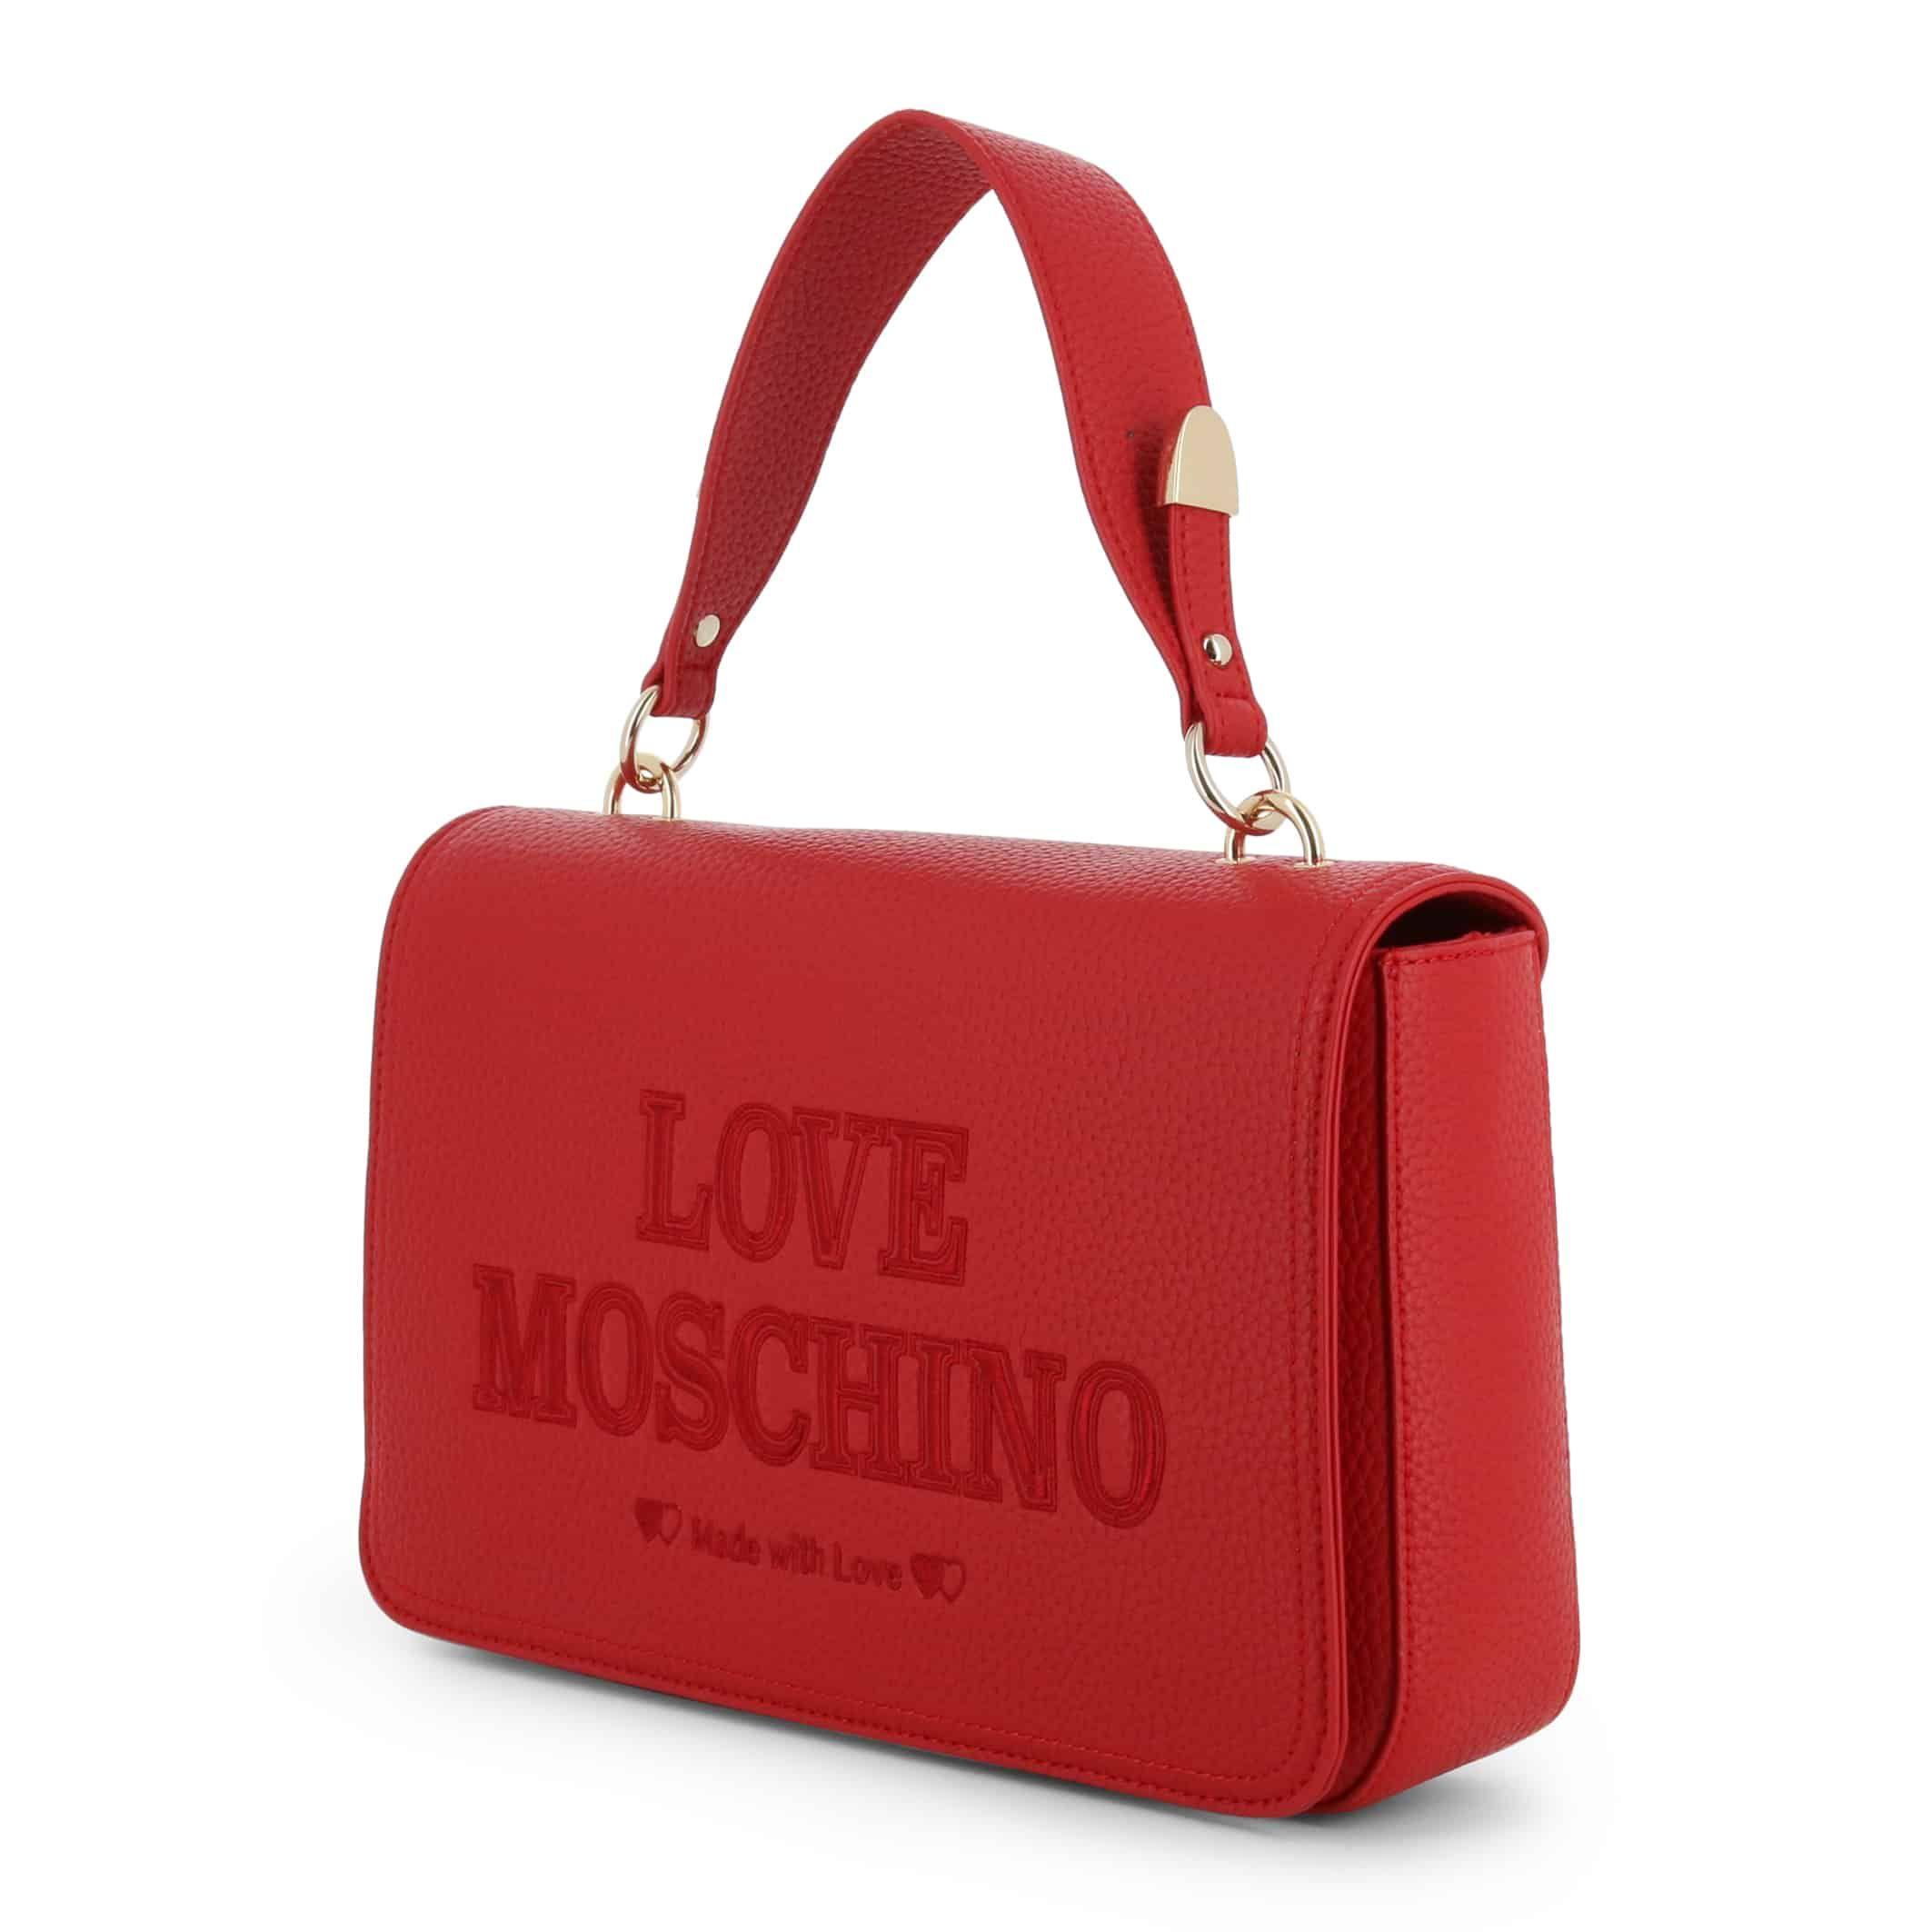 Sacs bandoulière Love Moschino – JC4288PP08KN